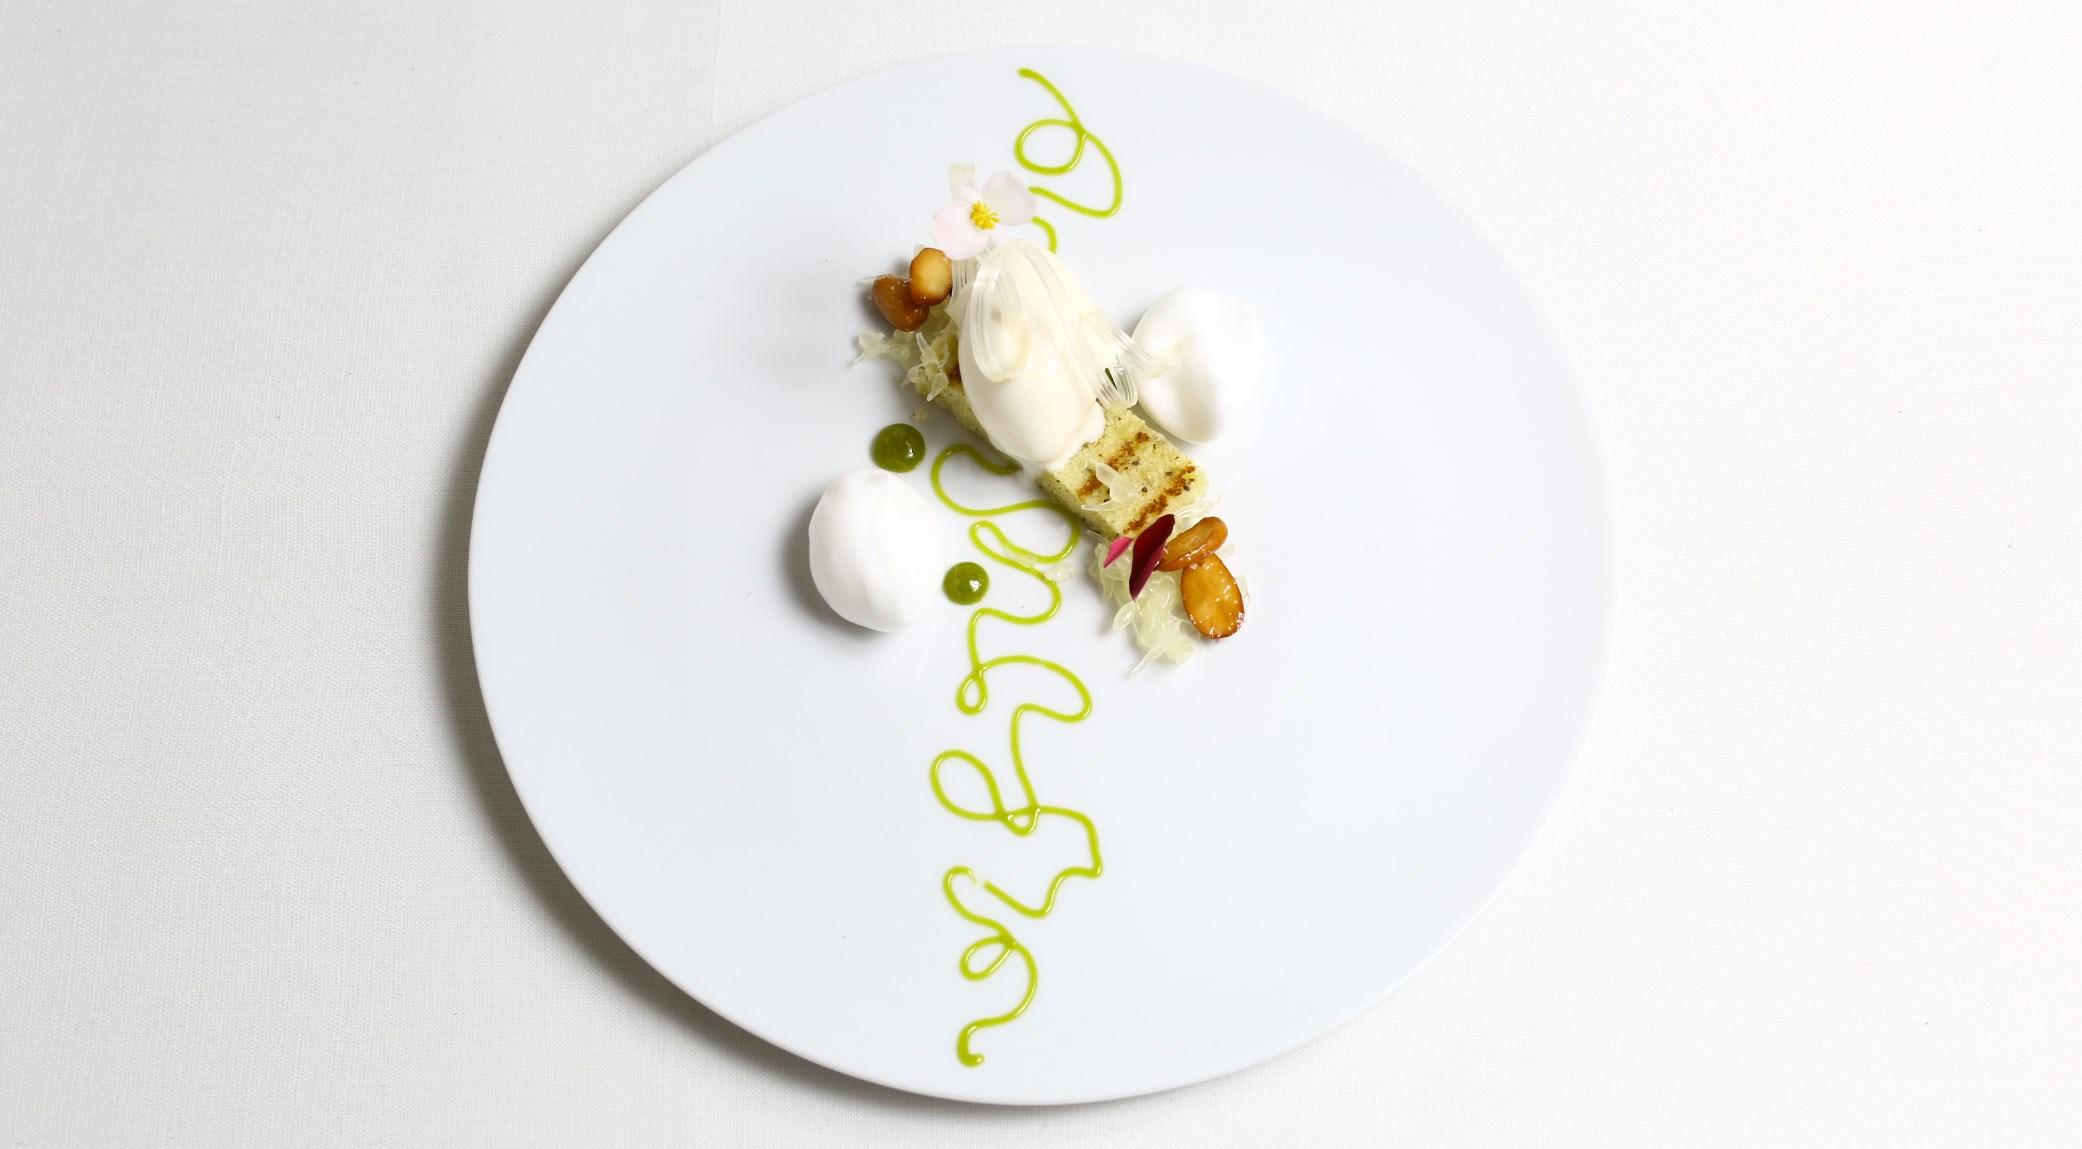 latin-america-spyc-dish